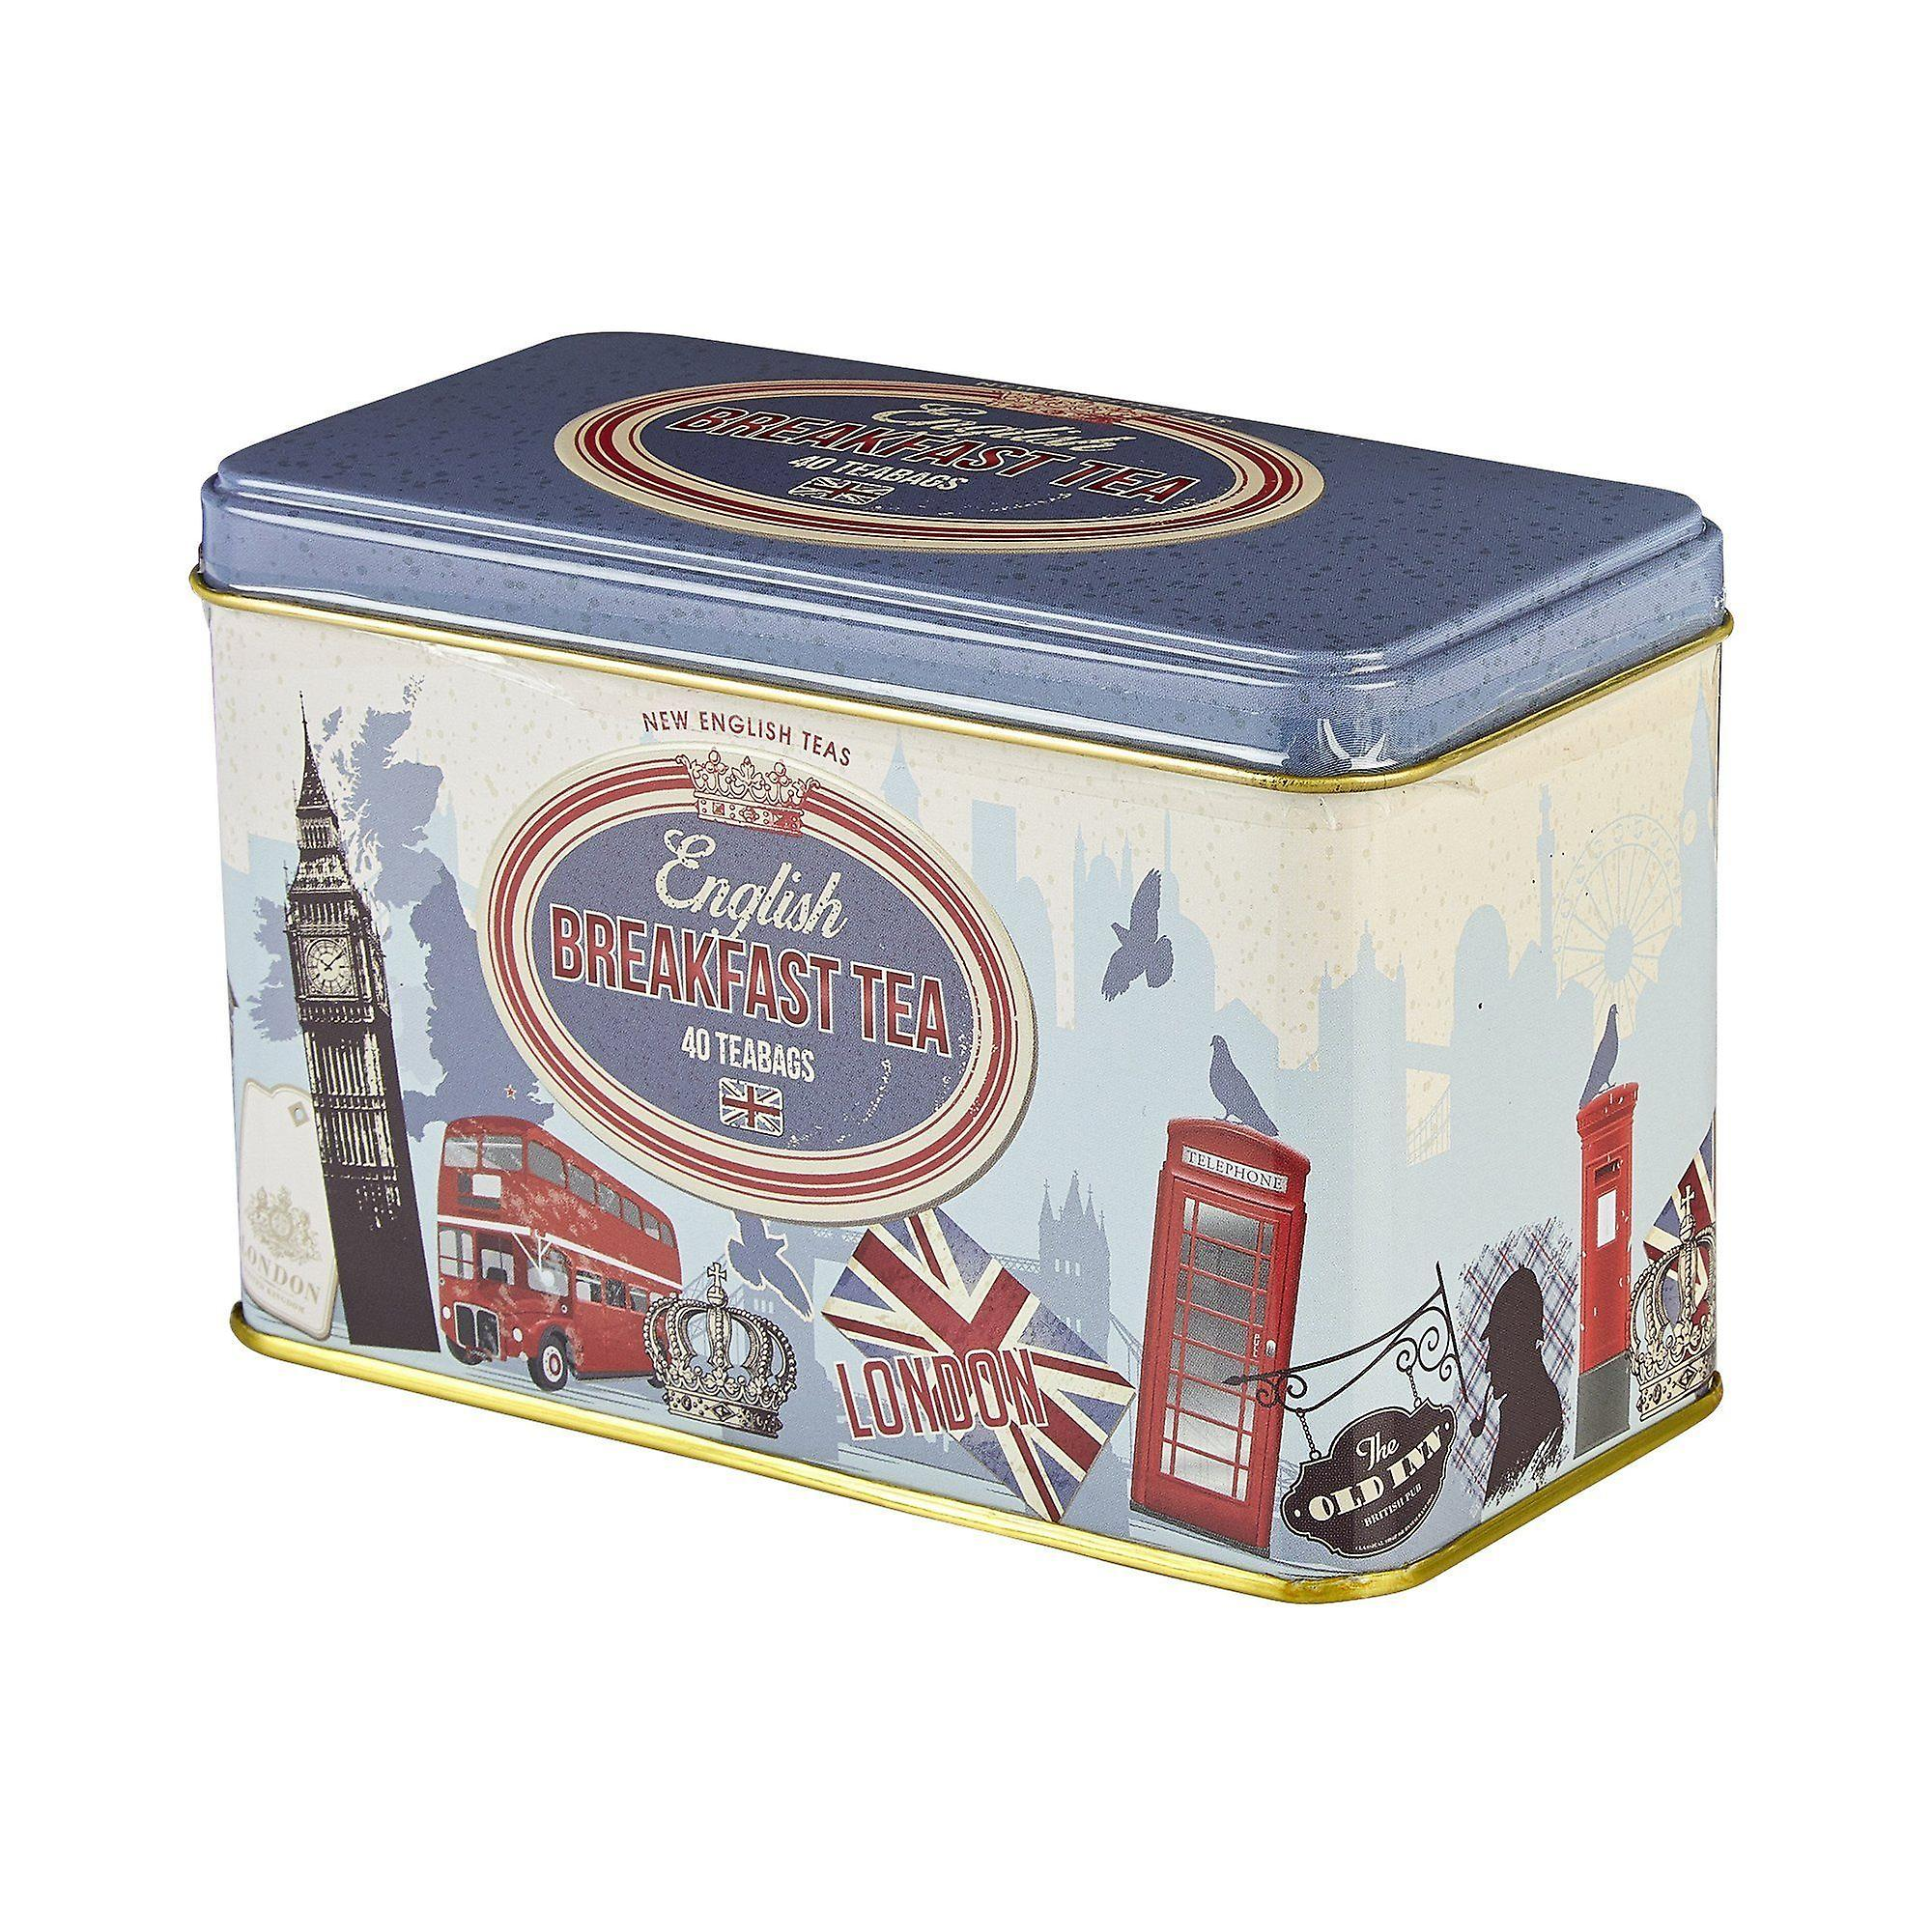 Retro london english breakfast tea tin 40 teabags